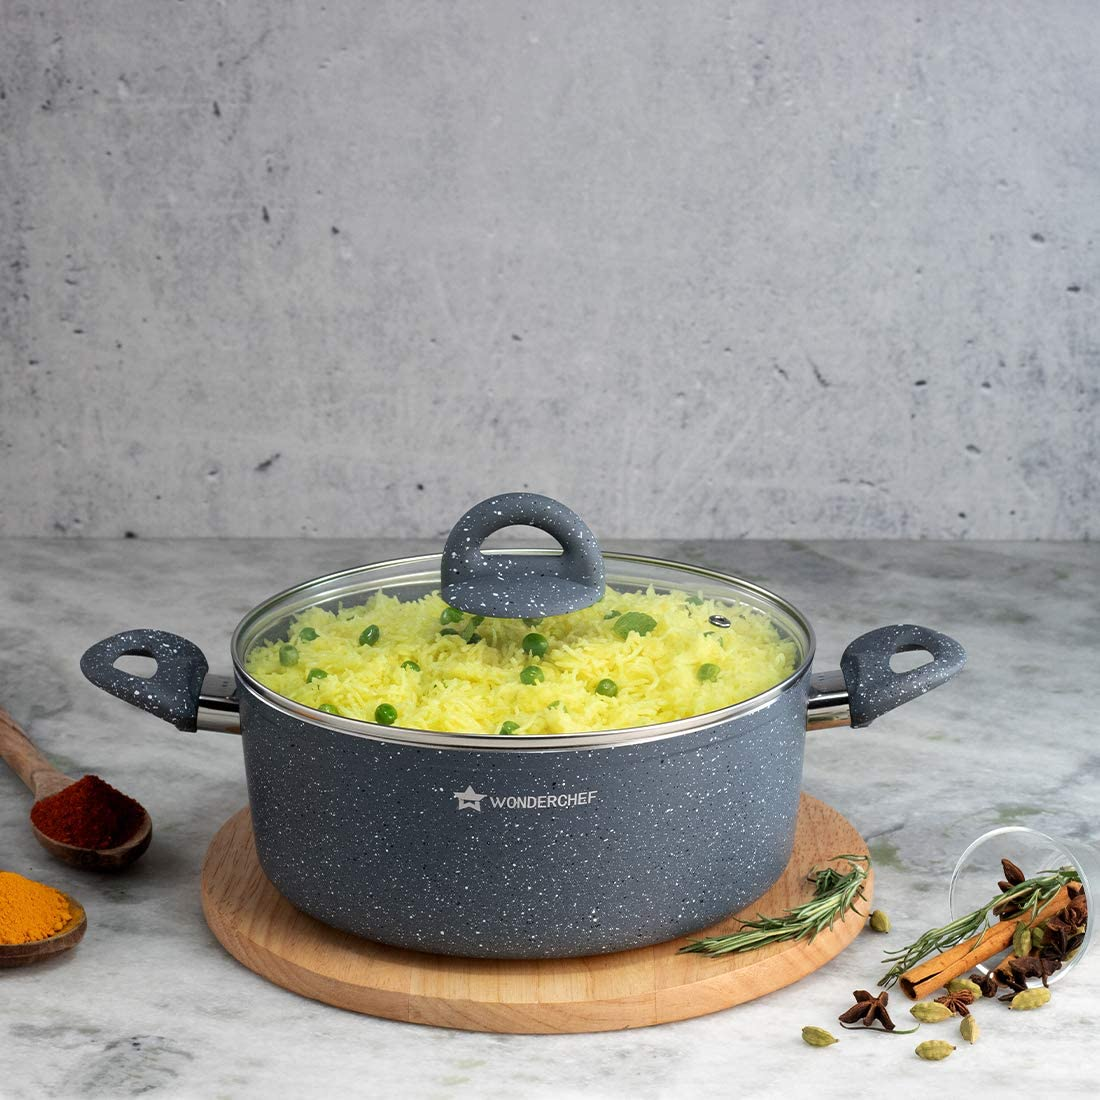 Wonderchef Granite Non-Stick Aluminum w Cooking Casserole 安い オリジナル Indian